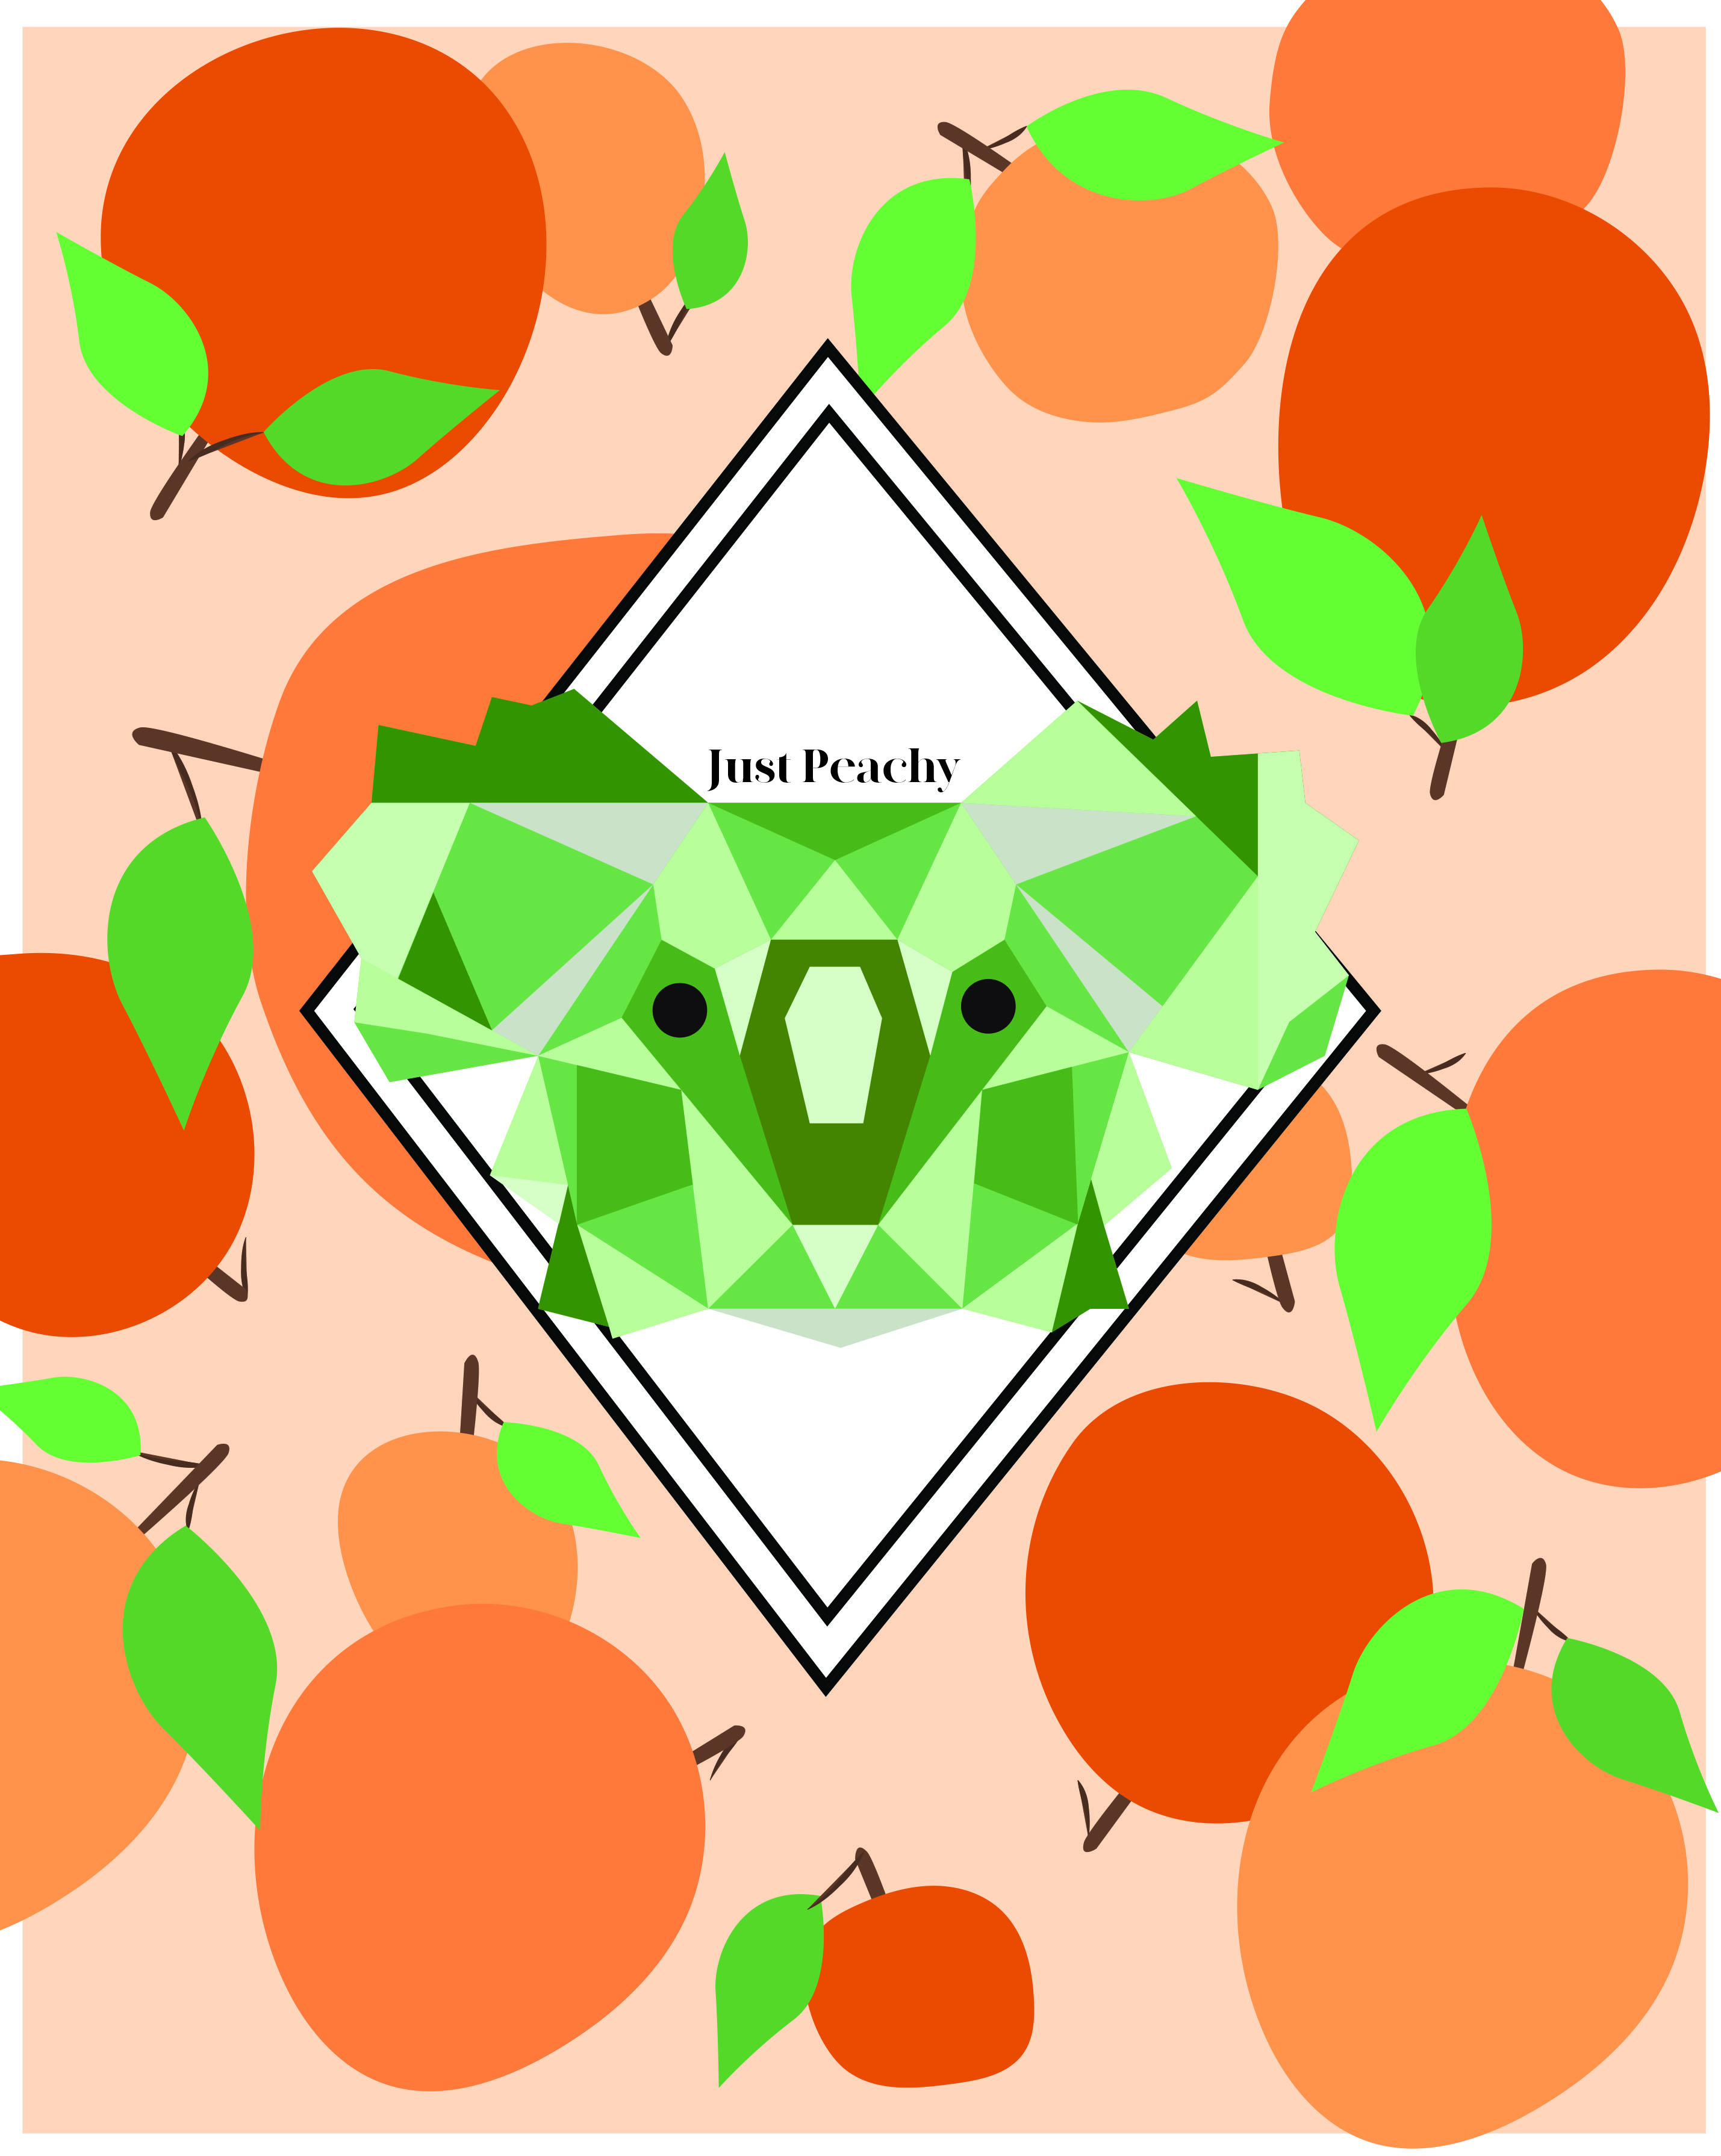 Just Peachy Packaging Design